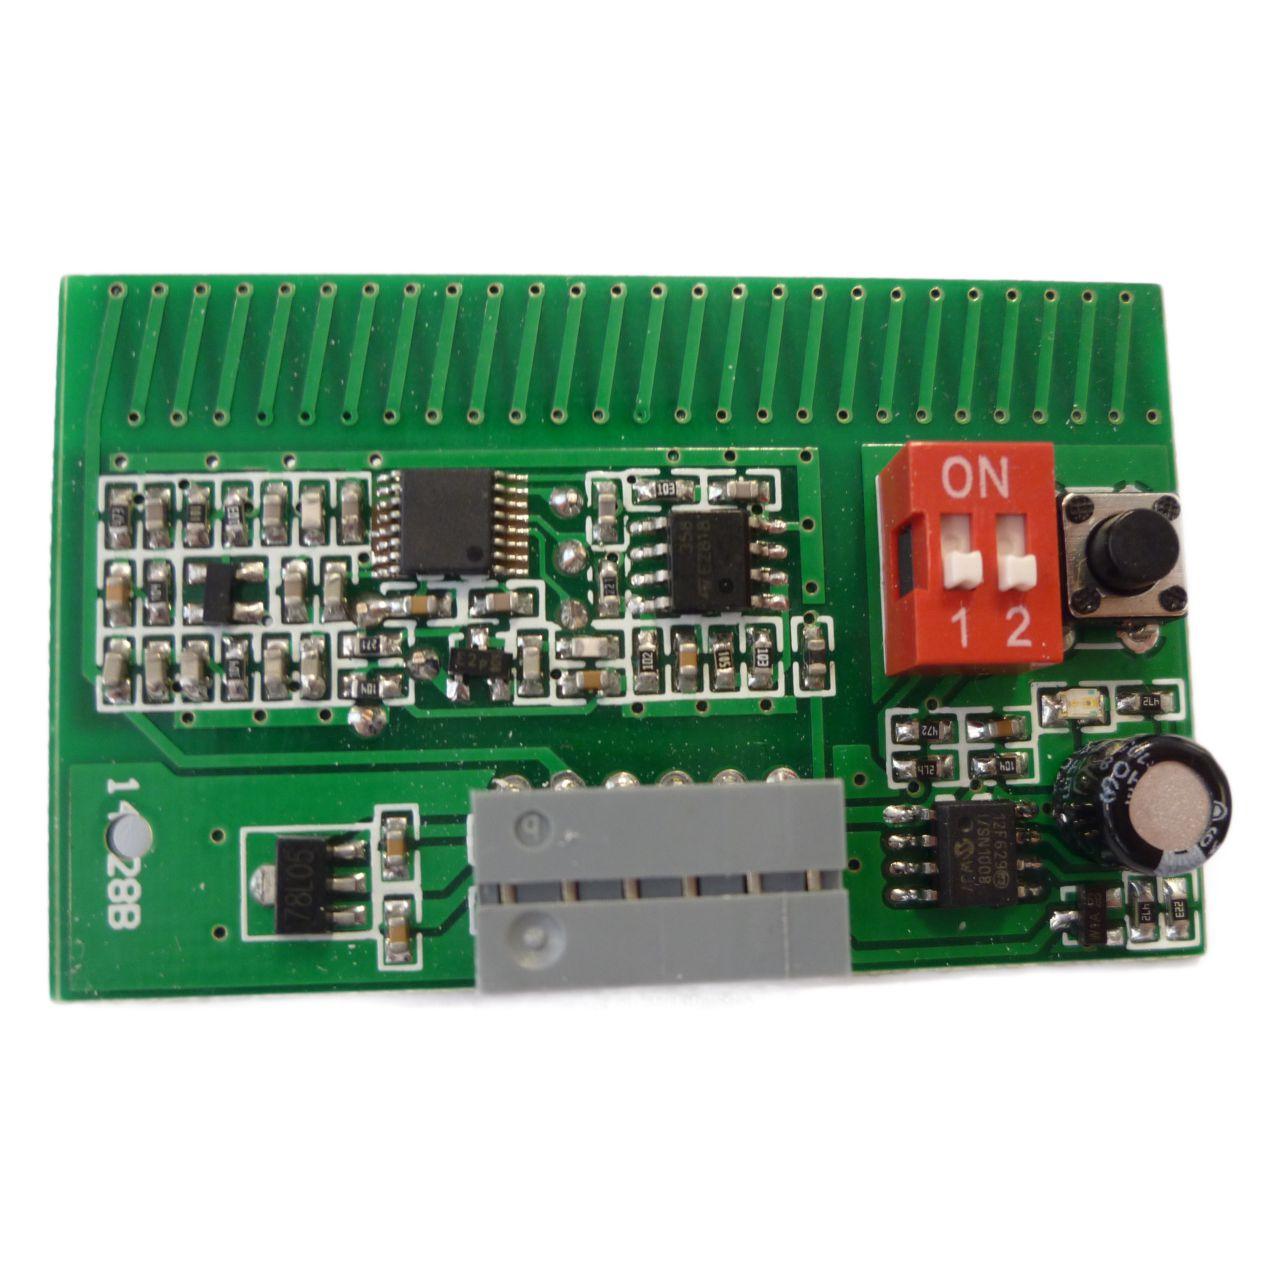 Prijemnik LRRE1 - plug in, rolling code (433,92MHz)